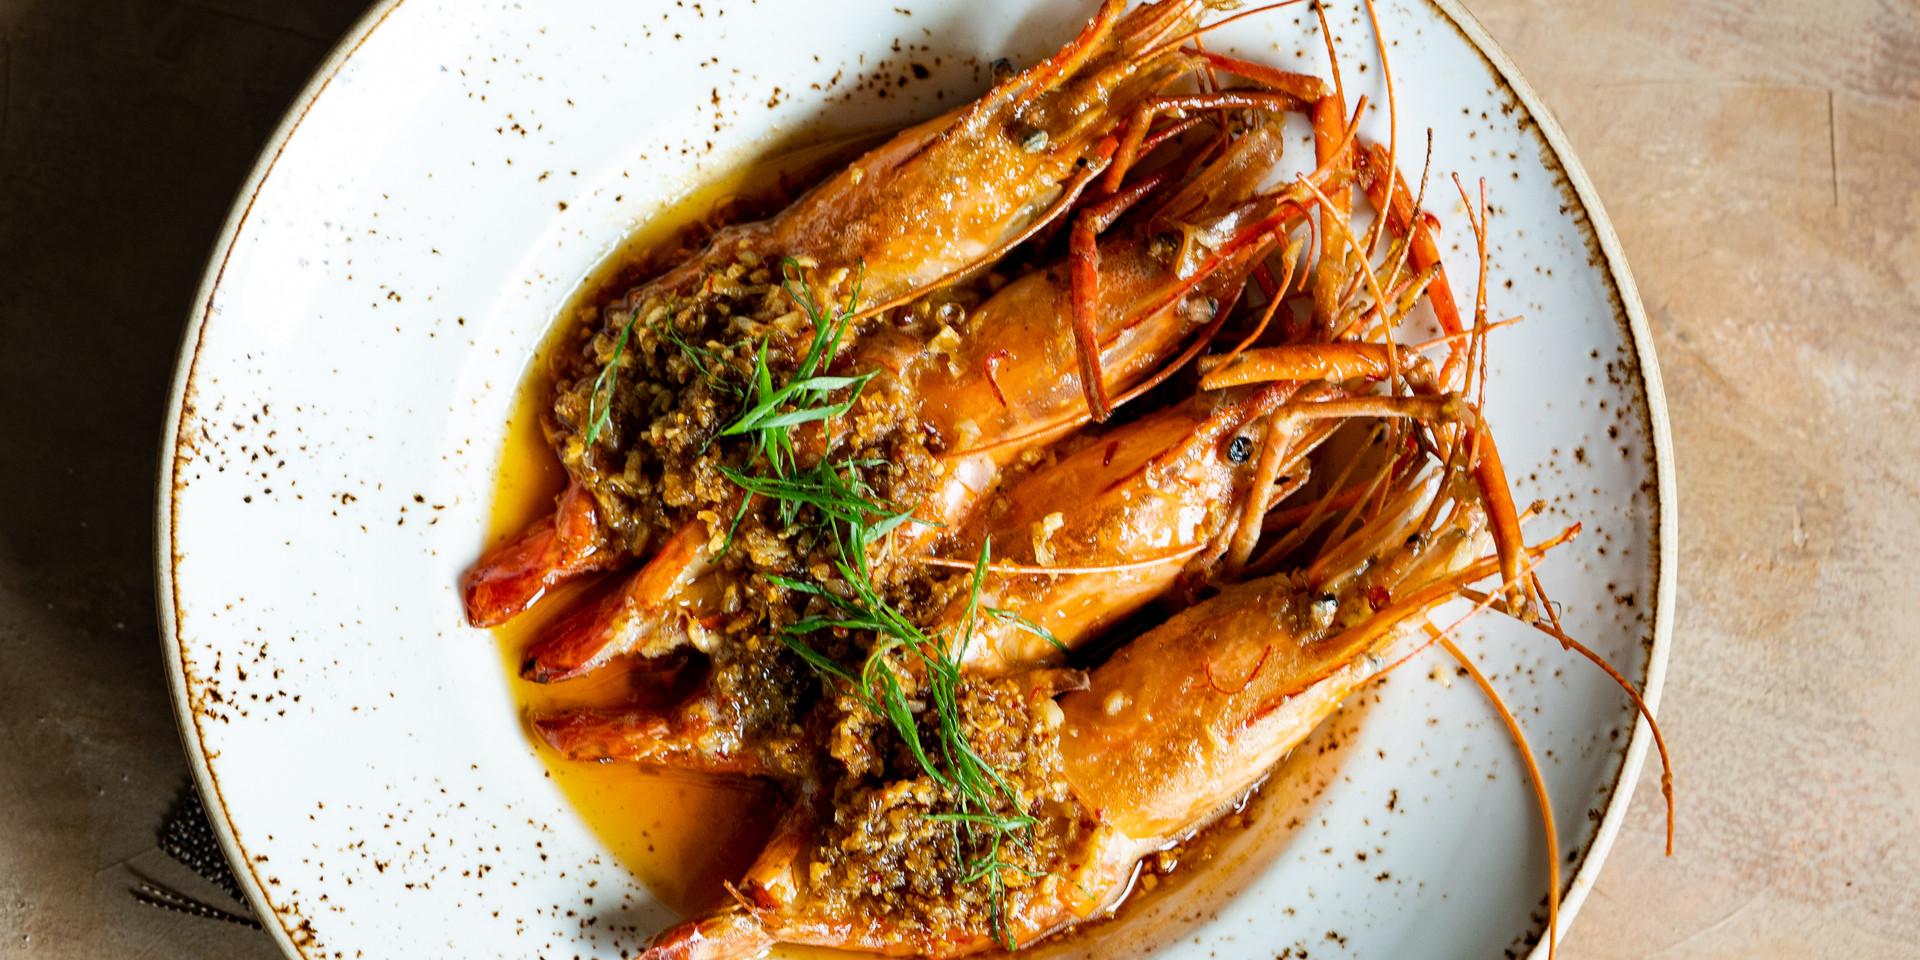 Macau style lobster by Bastian Mumbai